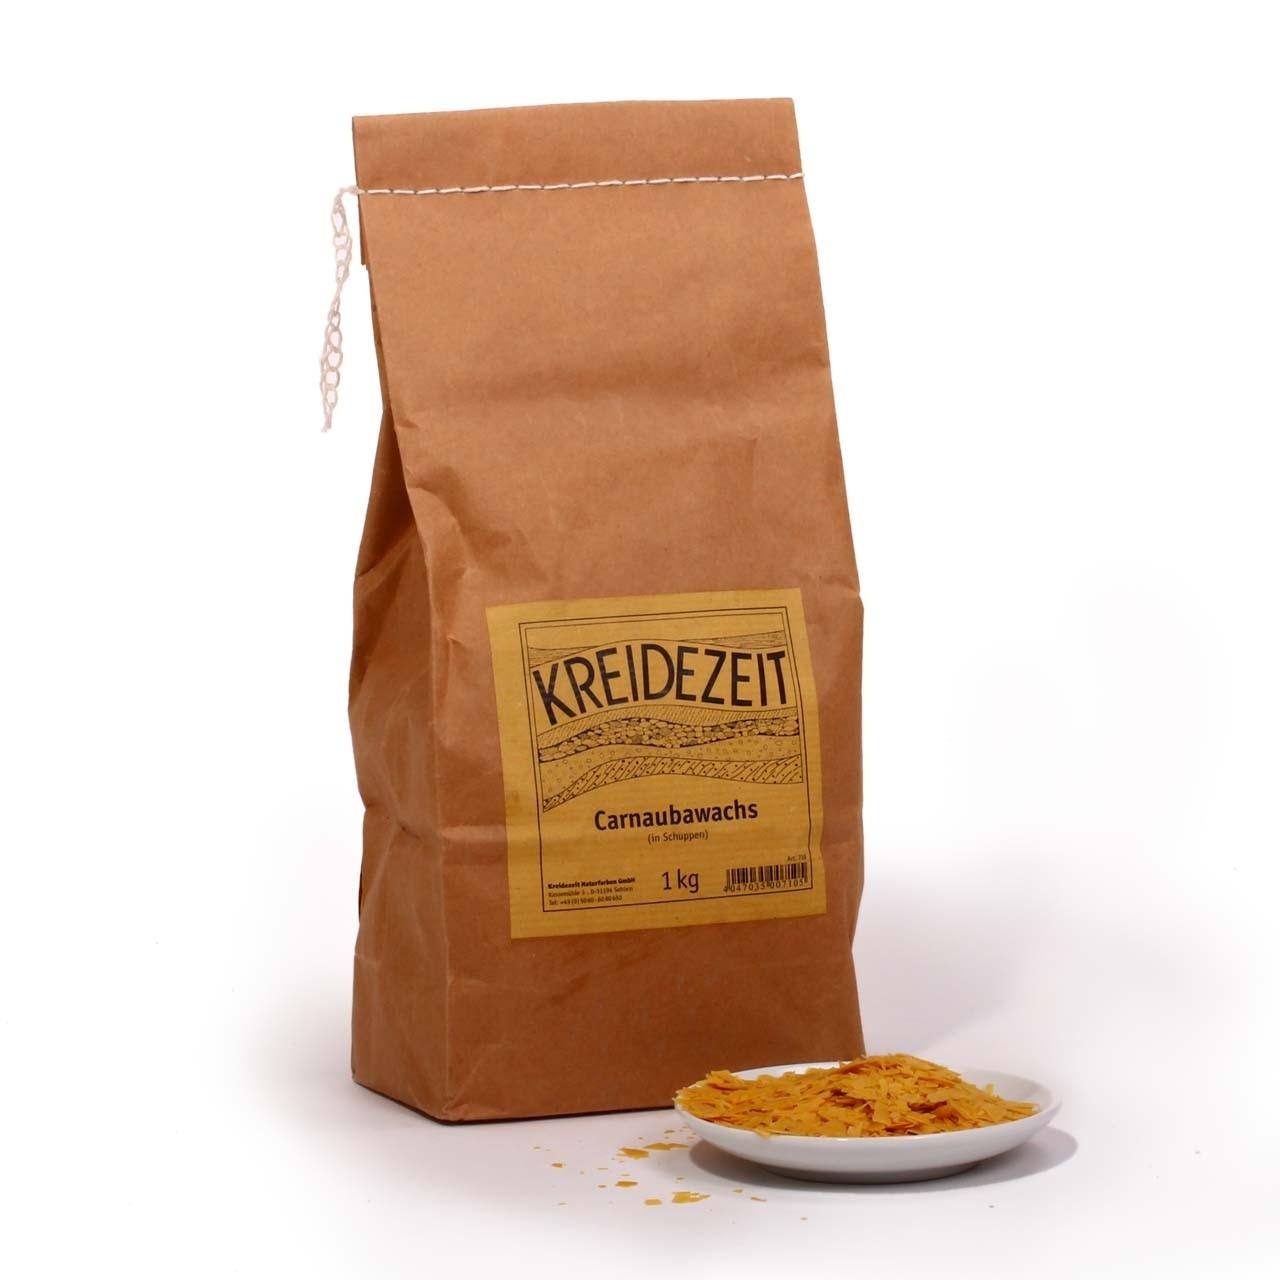 KREIDEZEIT Carnaubawachs (in Schuppen) 1 kg